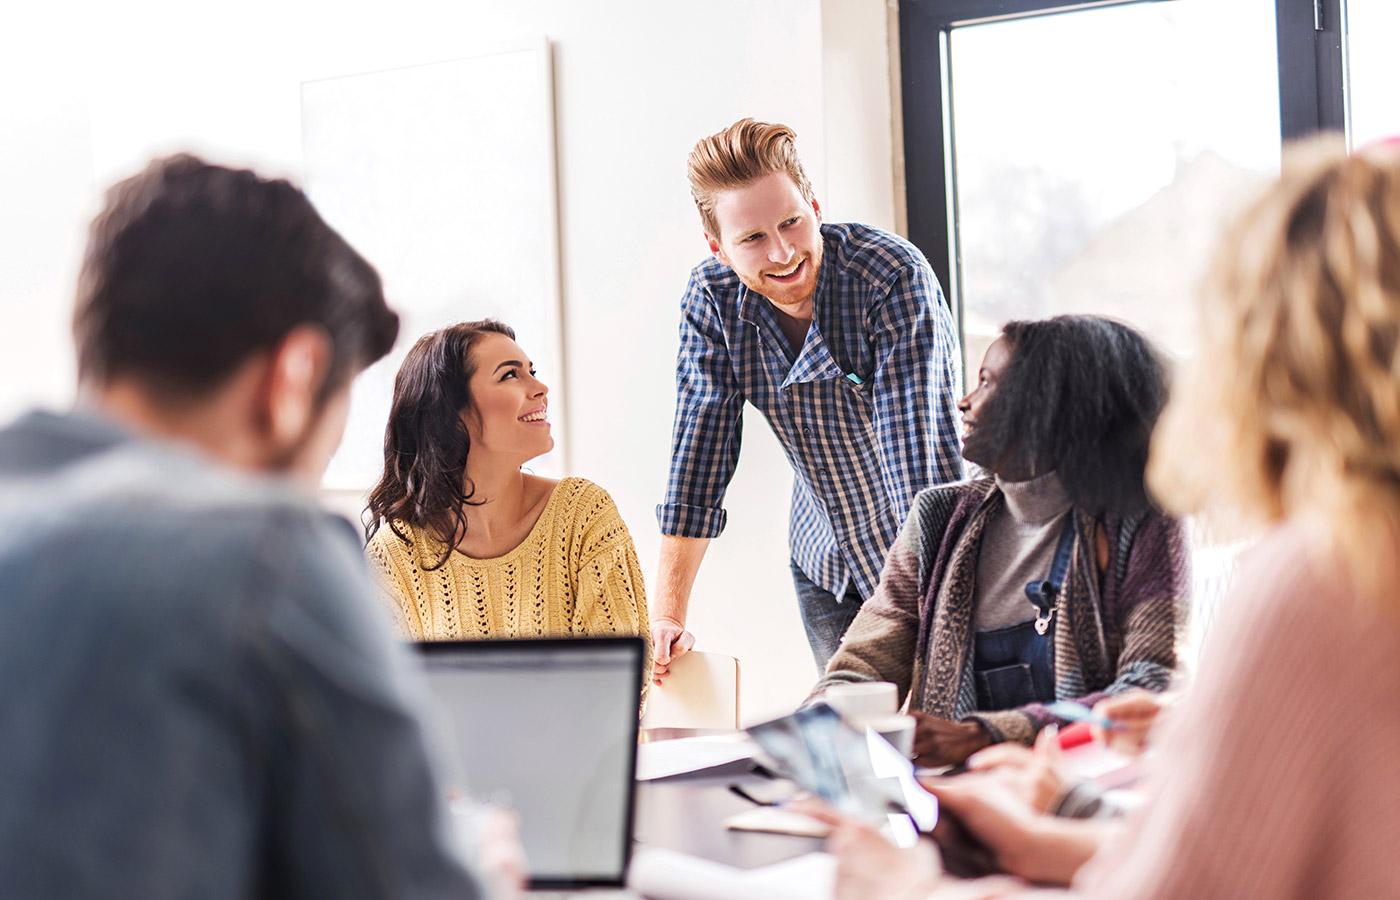 Career - CREALOGIX - The Leader for the Digital Bank